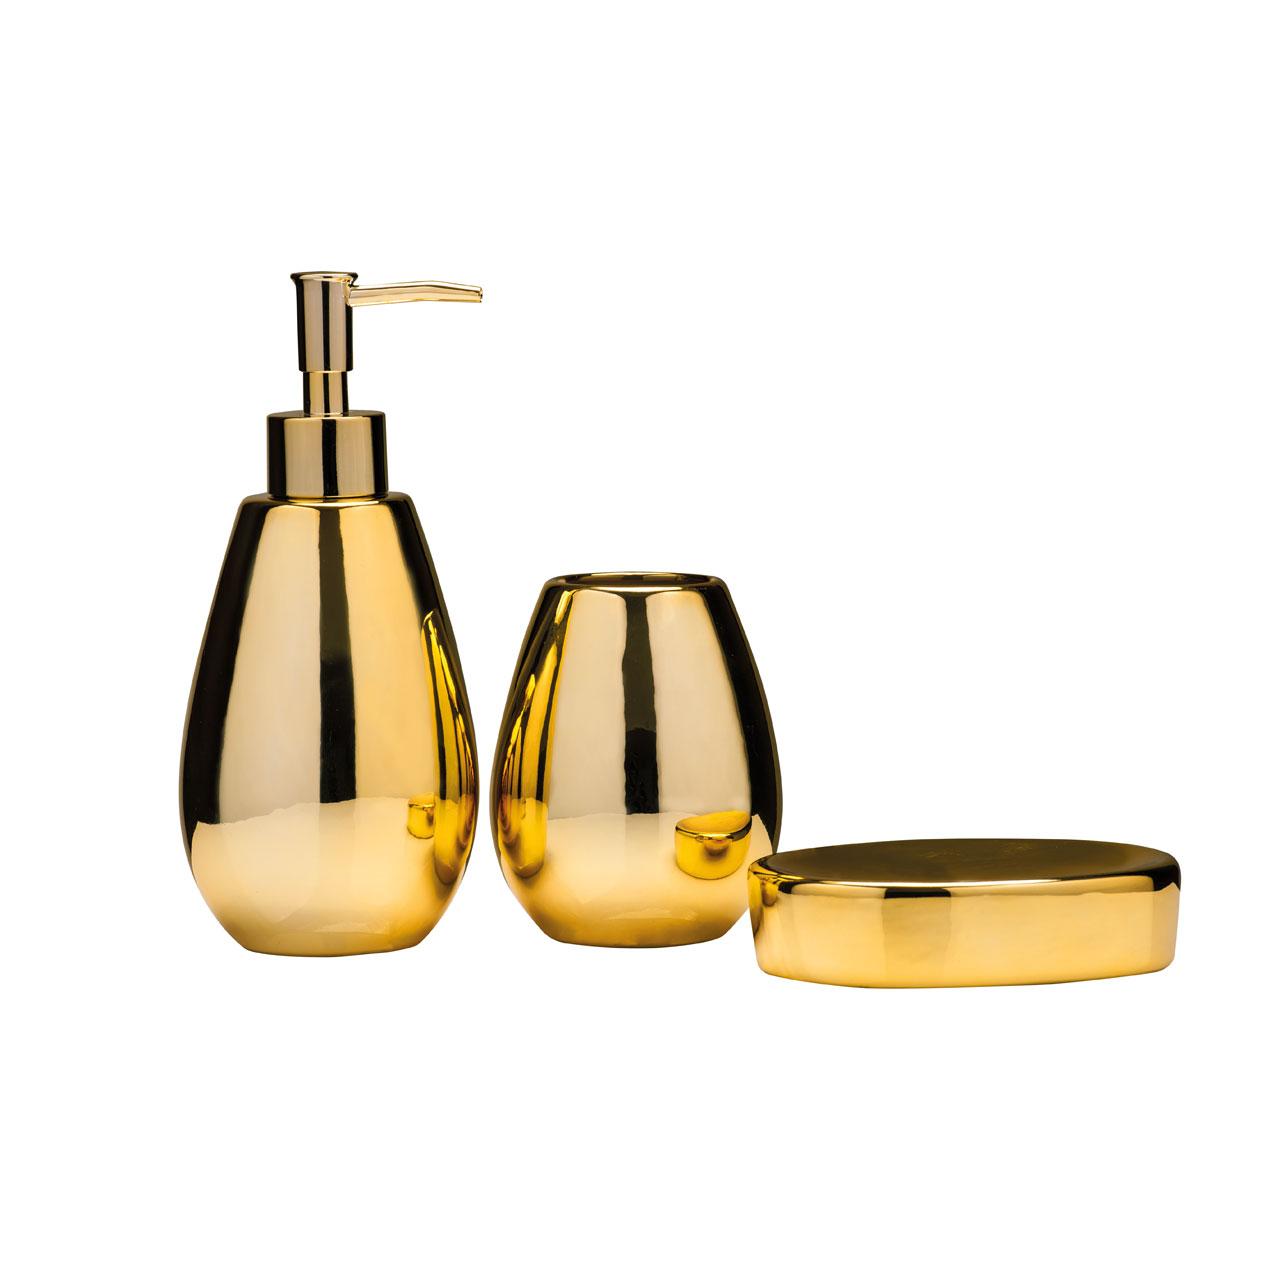 Premier housewares magpie gold bathroom accessory set for Gold bathroom accessories sets